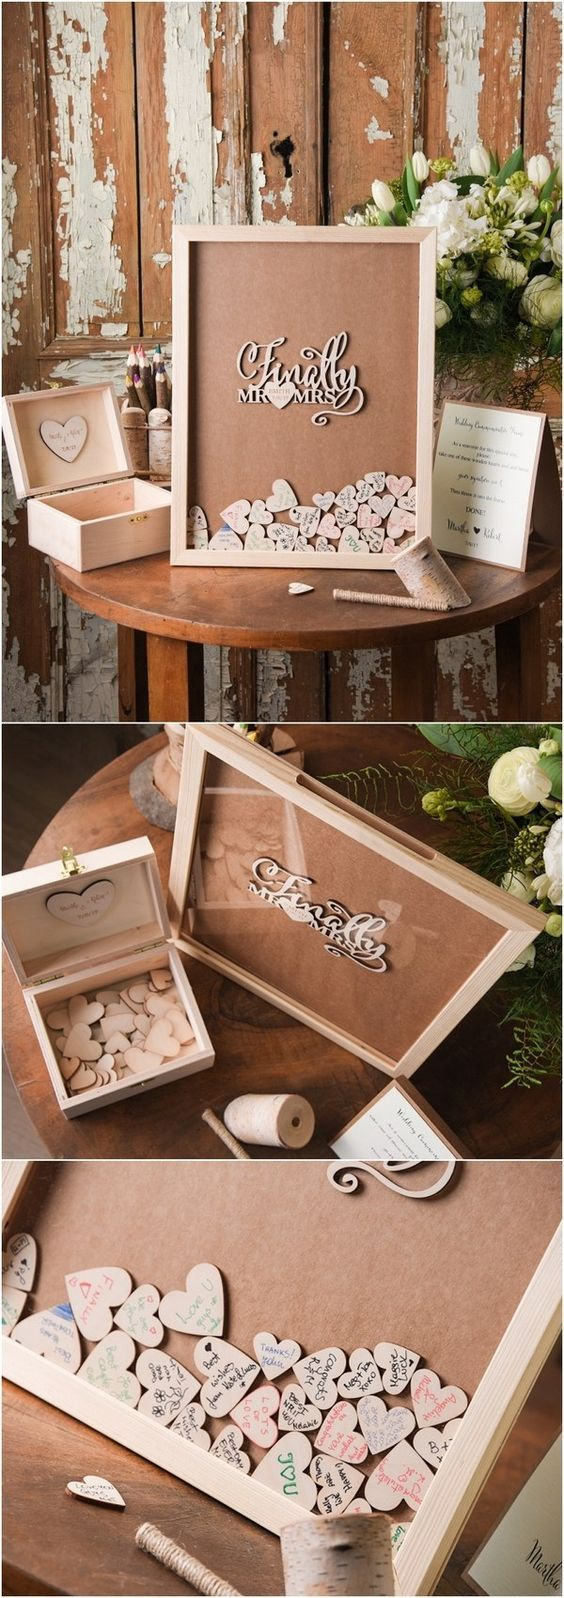 Rustic Laser Cut Wood Wedding Guest Book- Finally Mr&Mrs / http://www.deerpearlflowers.com/rustic-wedding-guest-books-botanical-wedding-invitations/